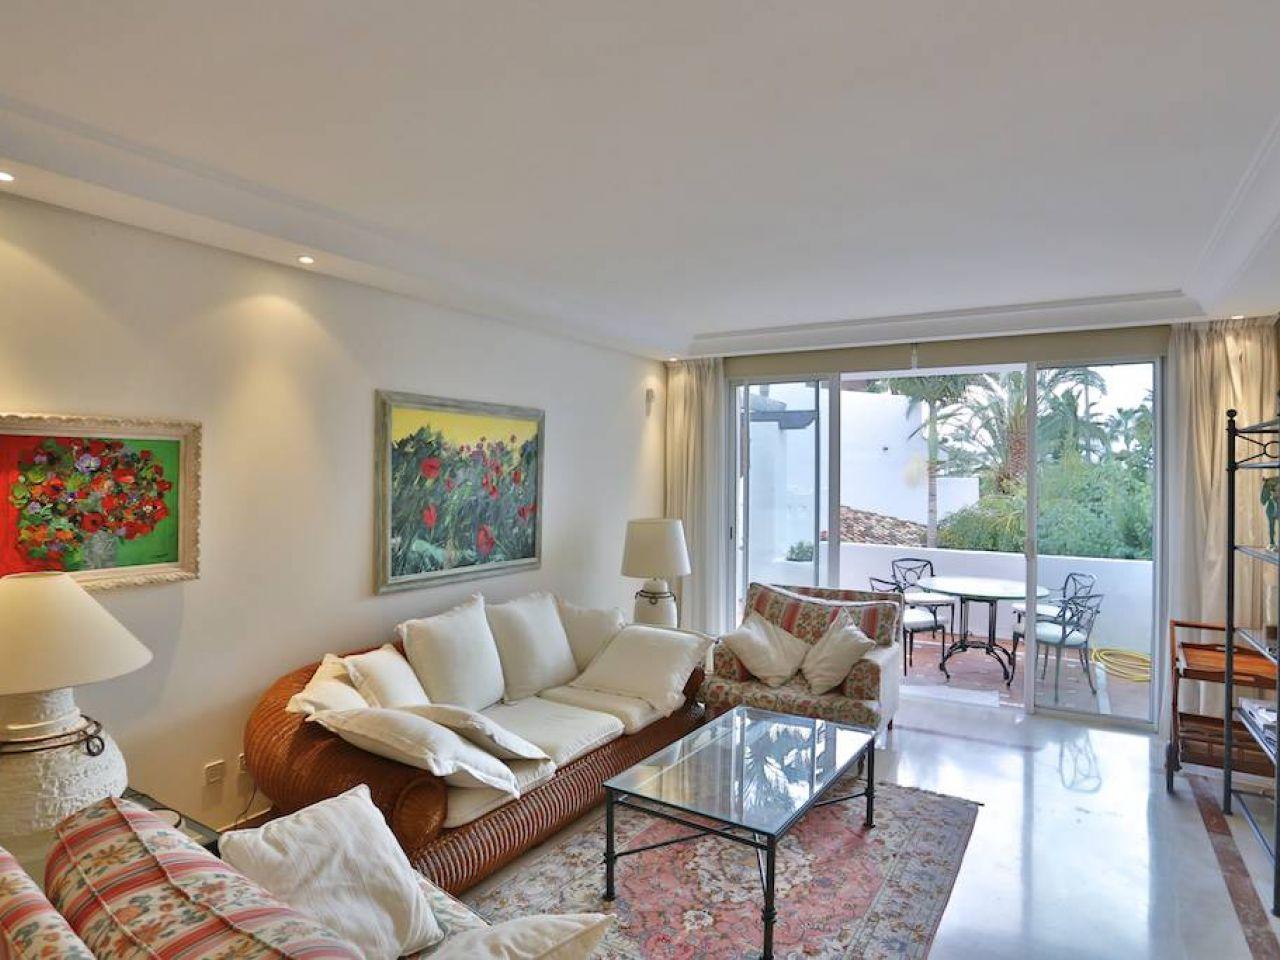 Appartement pour l Vente à Beachside apartment Puerto Banus Marbella, Costa Del Sol 29660 Espagne